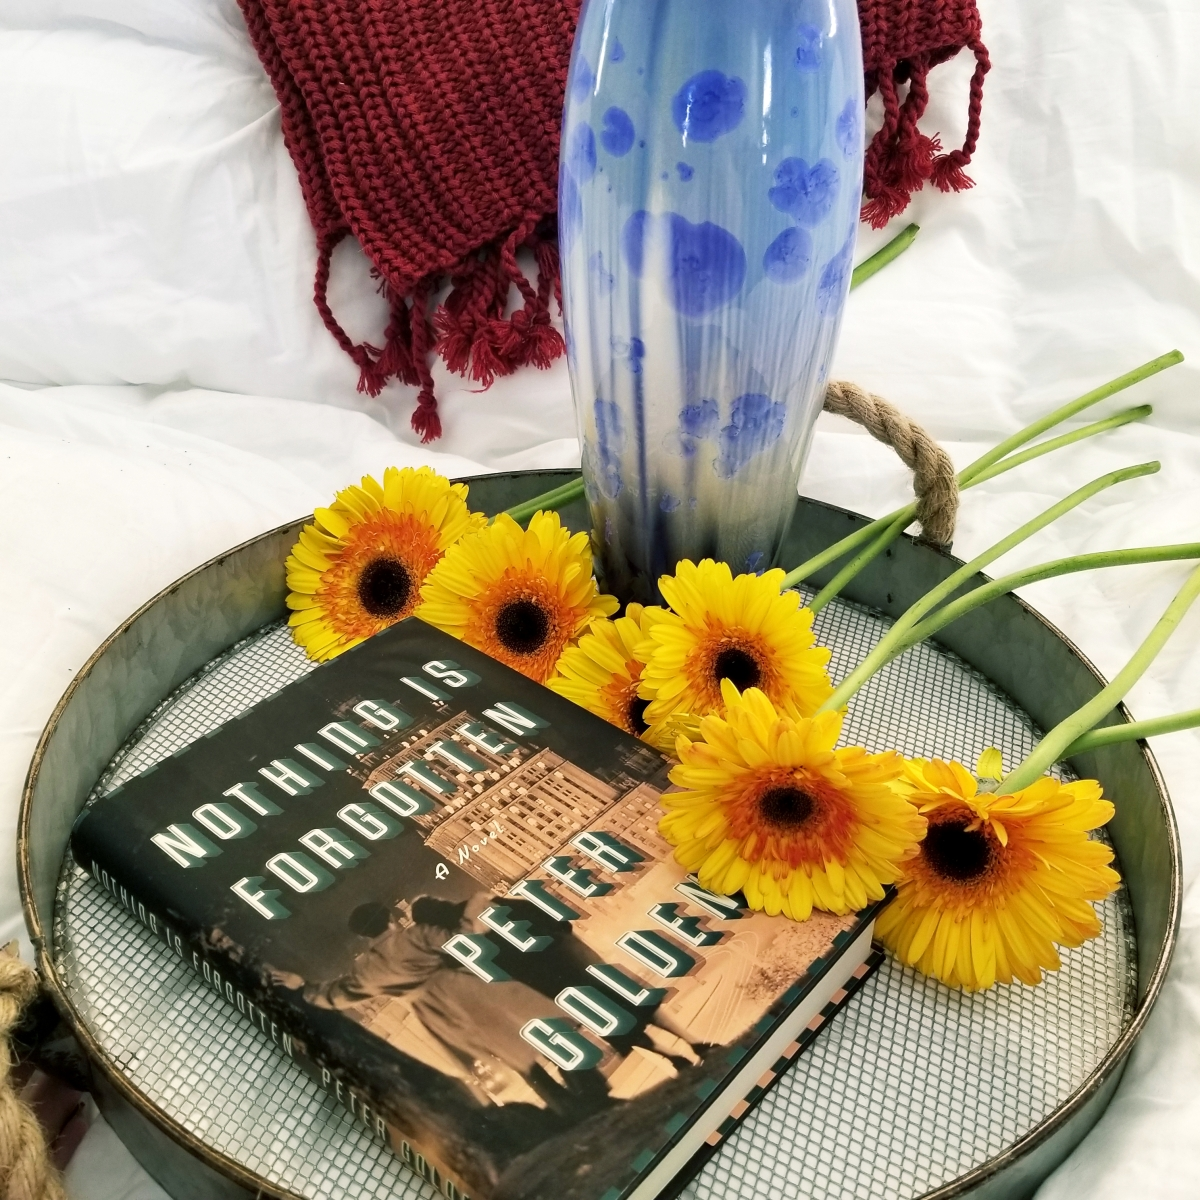 Nothing is Forgotten by Peter Golden #bookreview #tarheelreader #thrnothingis @petergolden32 @atriabooks @tlcbooktours #nothingisforgotten #blogtour